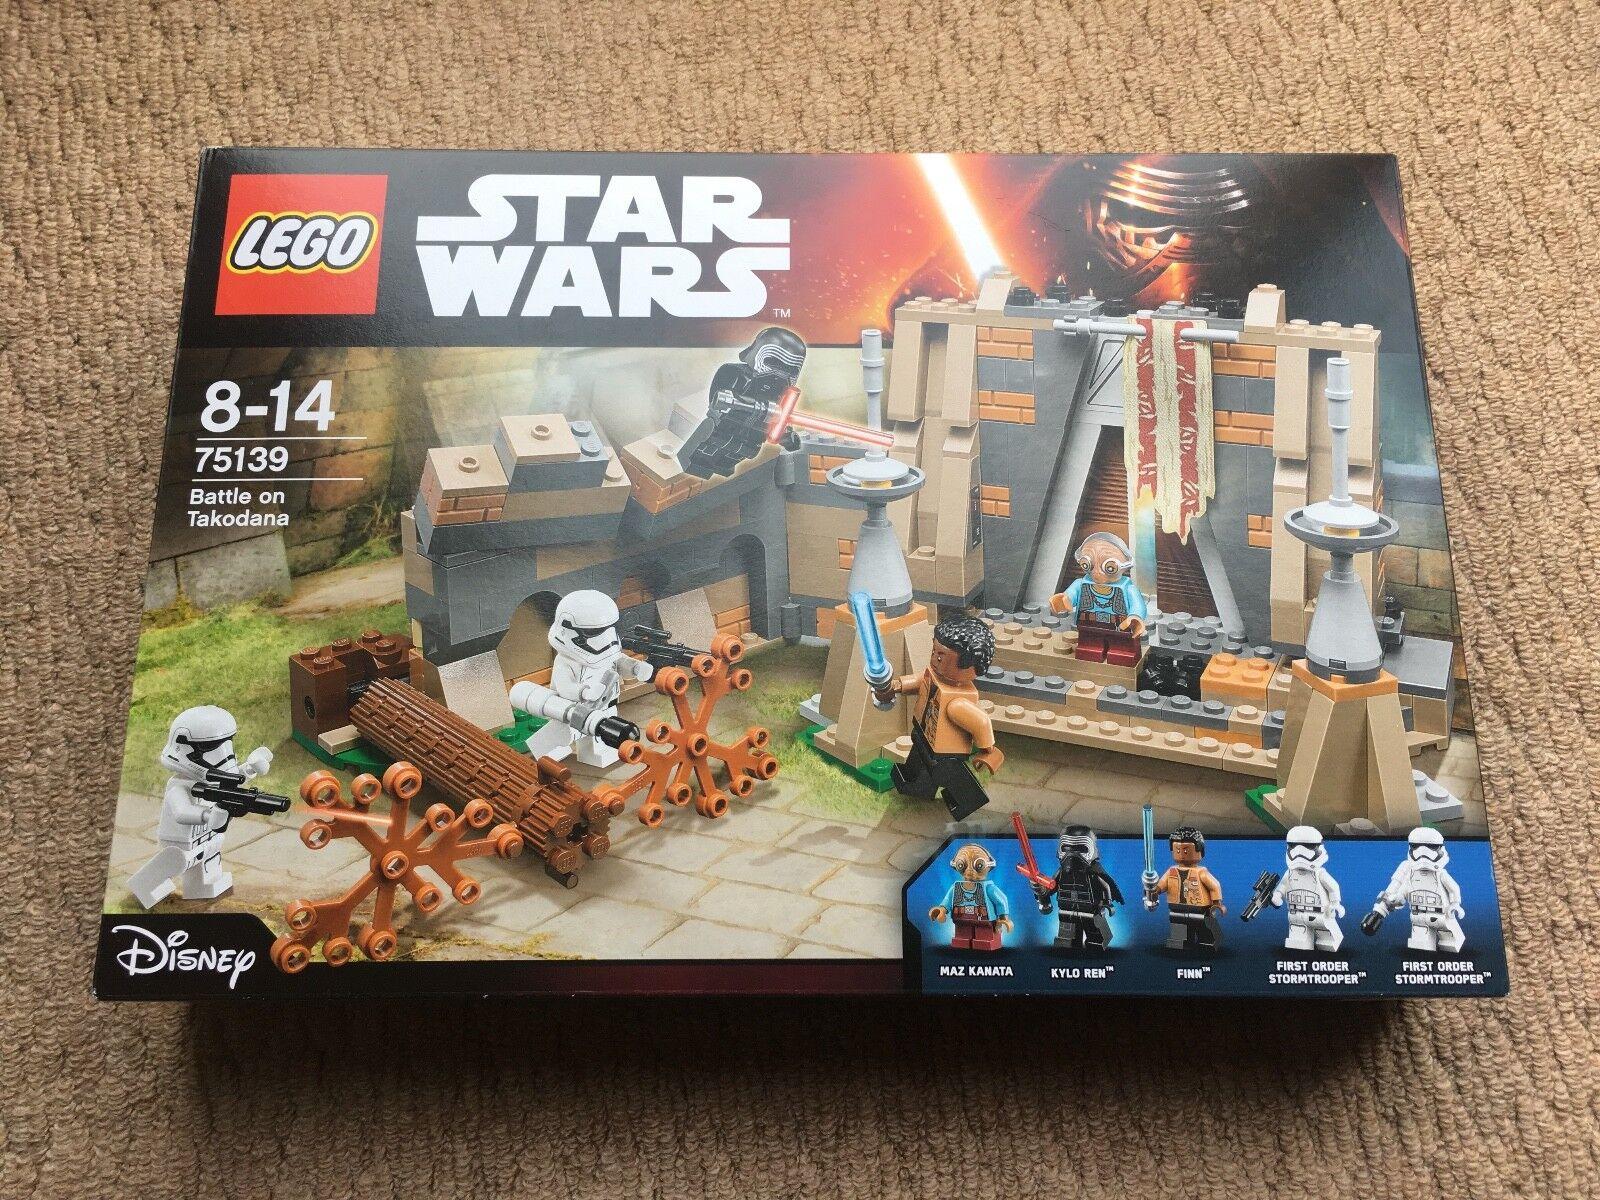 Lego Star Wars 75139 - Battle on Takodana - NEW - Retired - Boxed Sealed